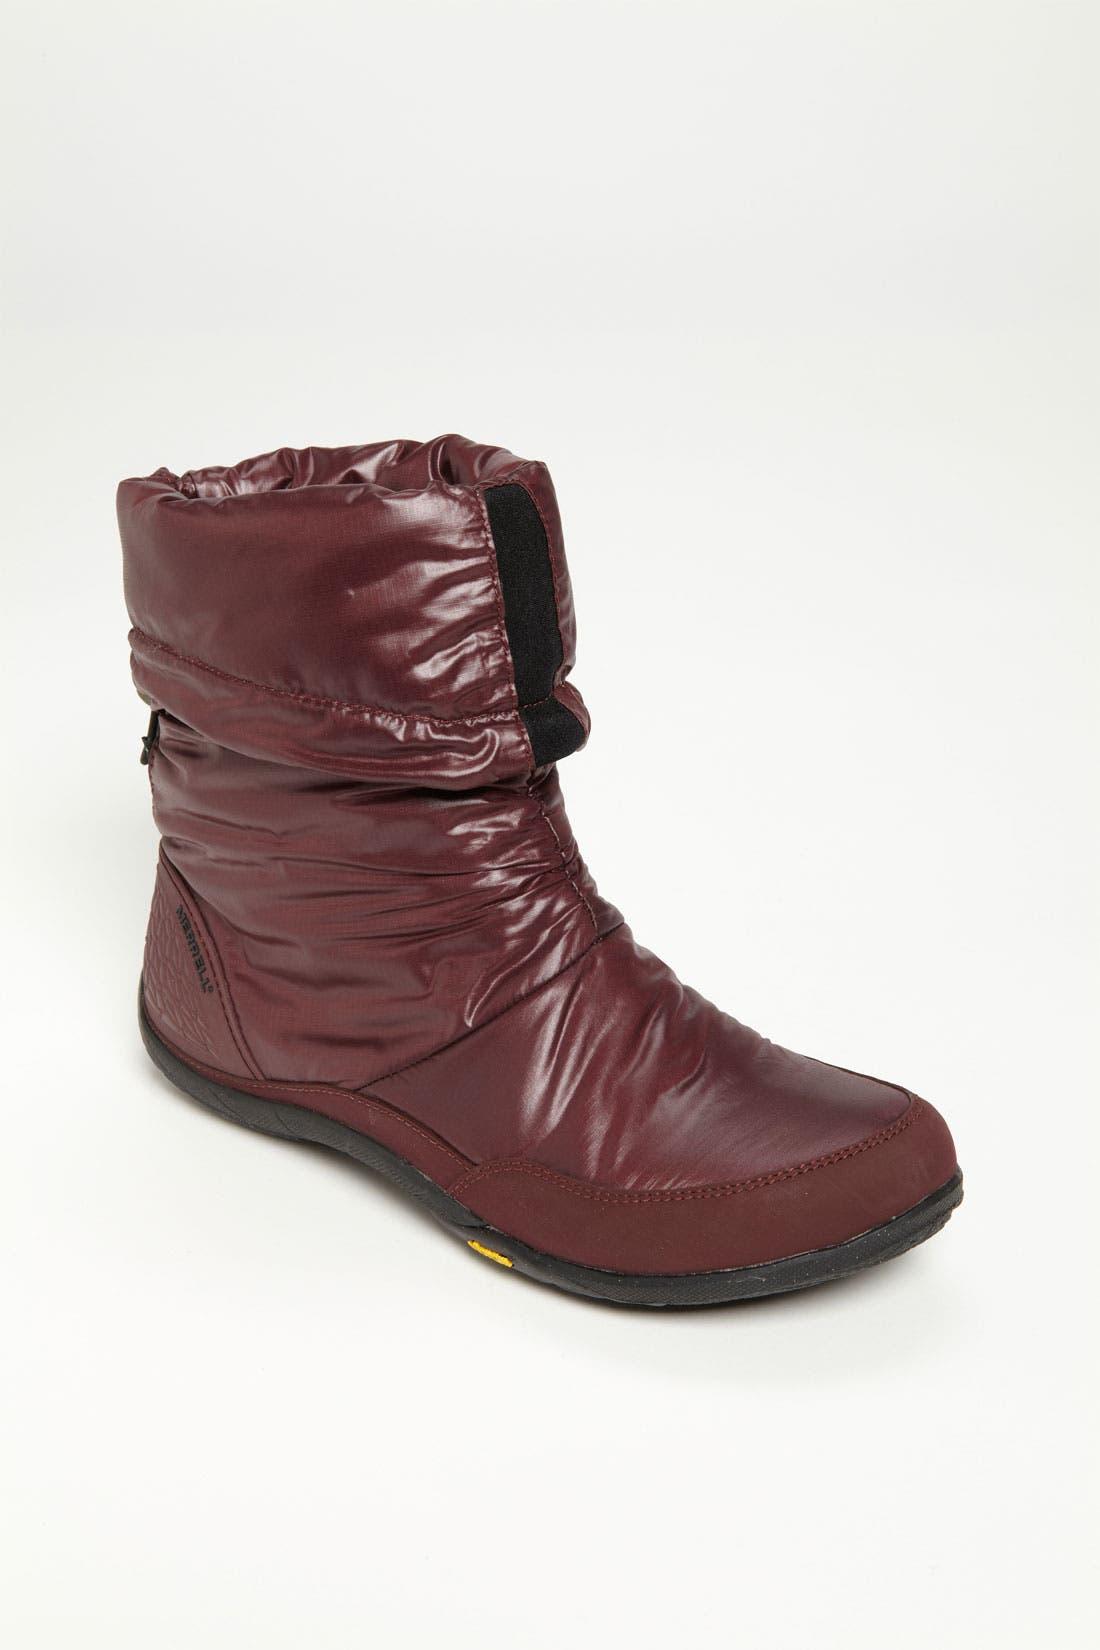 Alternate Image 1 Selected - Merrell 'Frost Glove' Boot